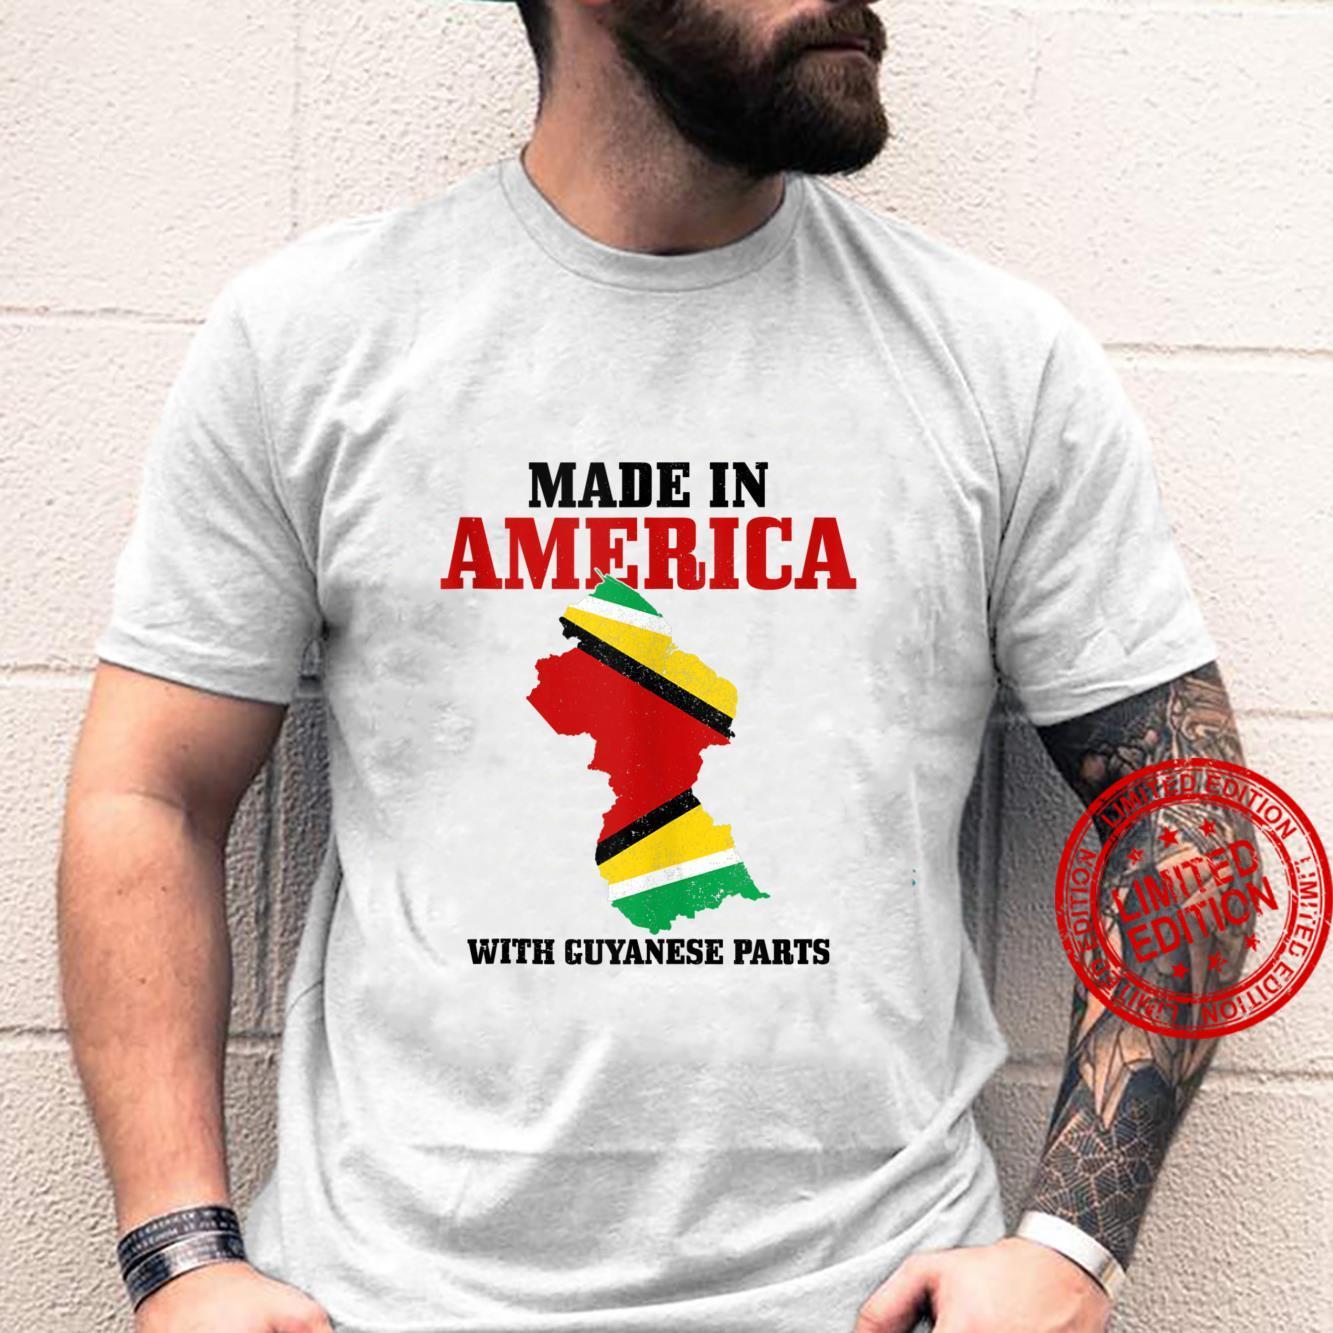 Guyanese Pride American Guyanese Parts Guyana Flag Shirt